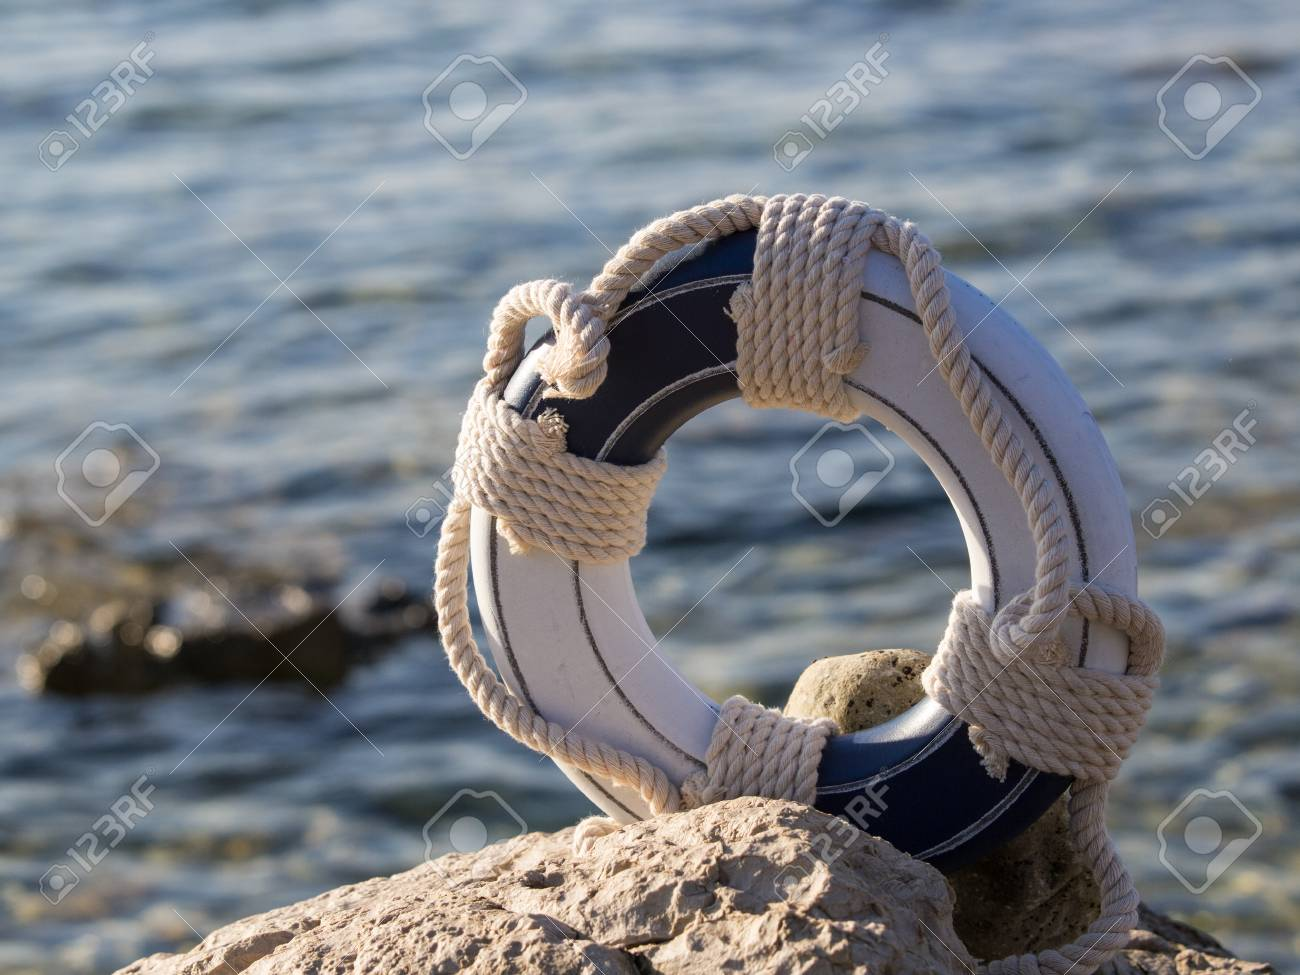 safe belt on the stone near the sea Stock Photo - 15414053